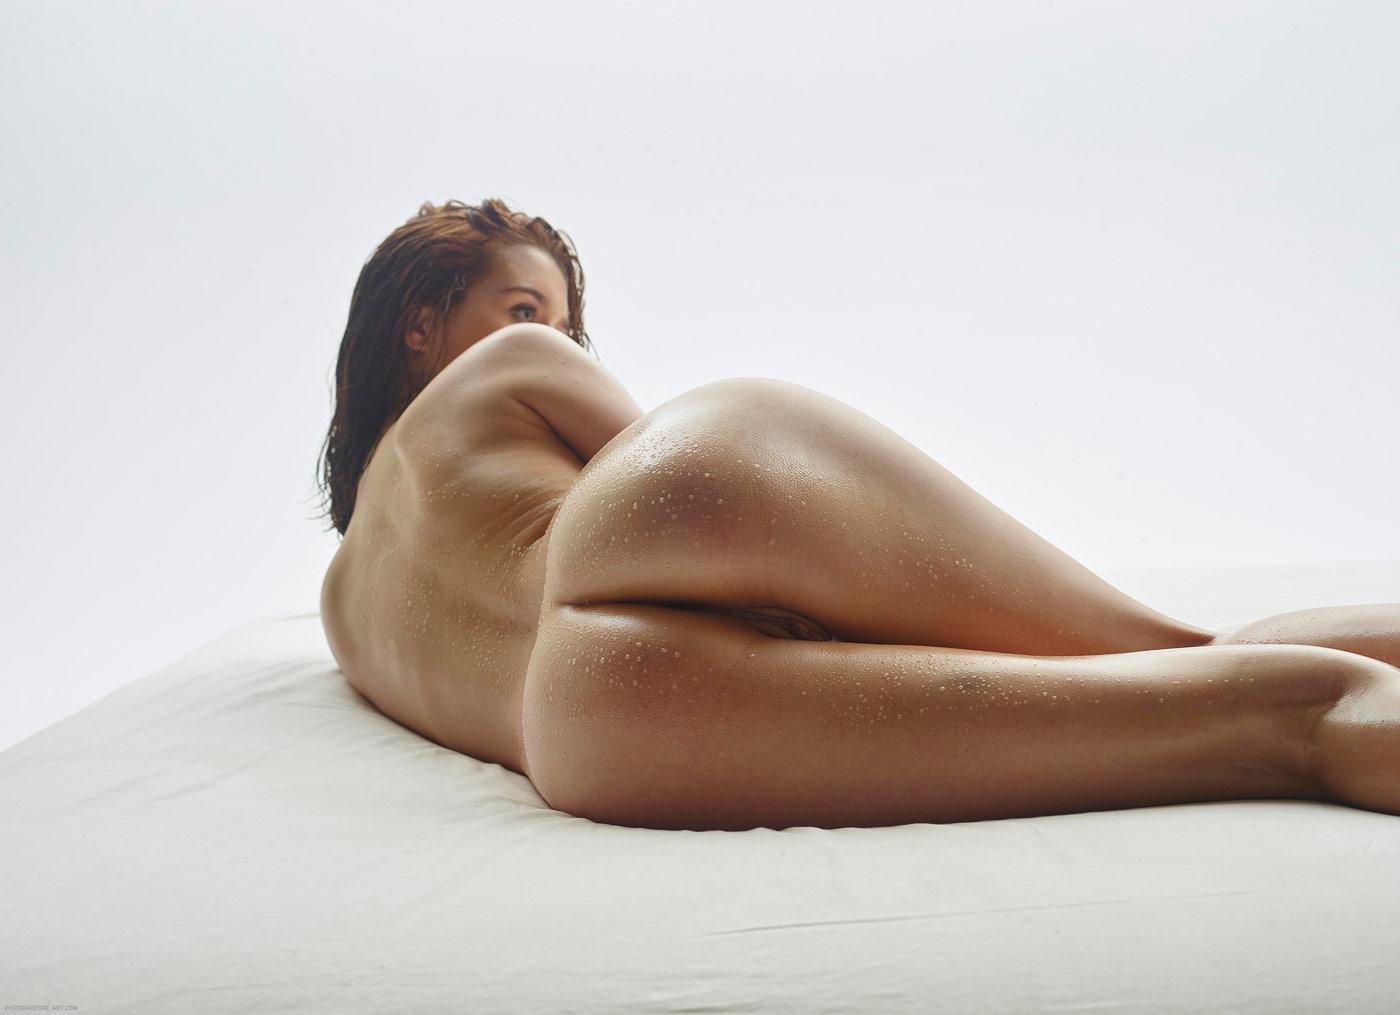 Something is. Princess laika nude and